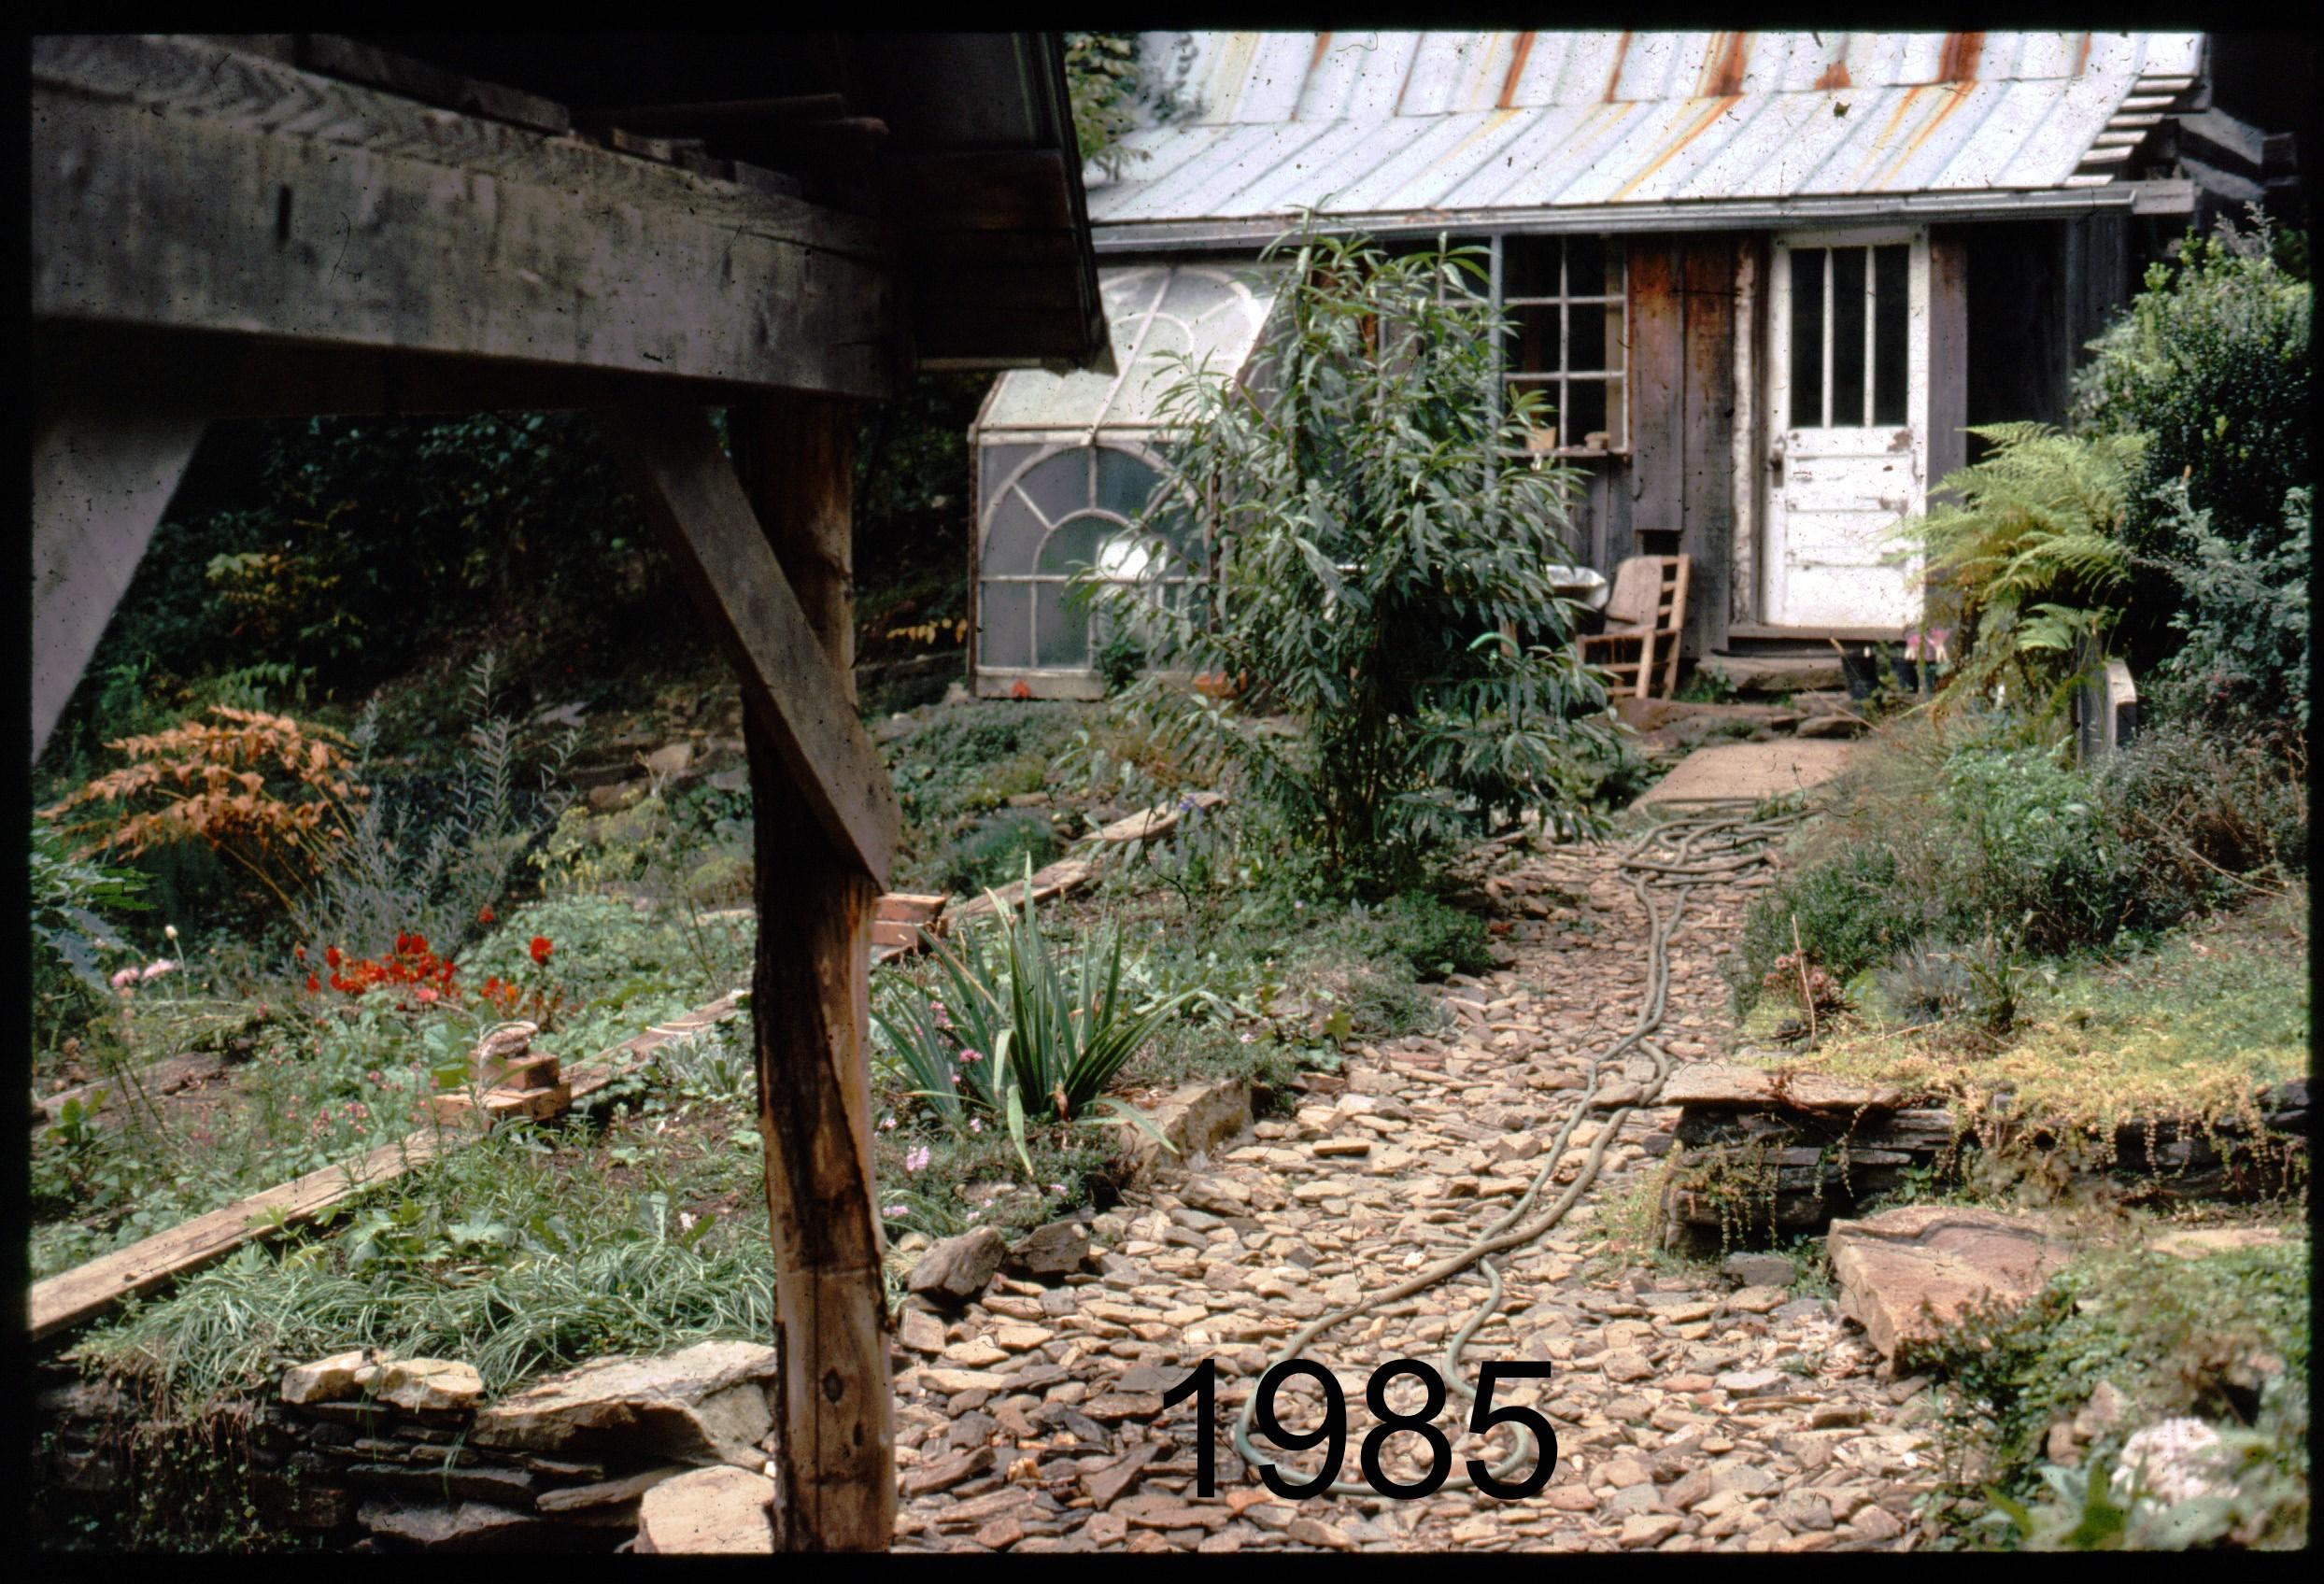 1985 shed - cabin.jpg